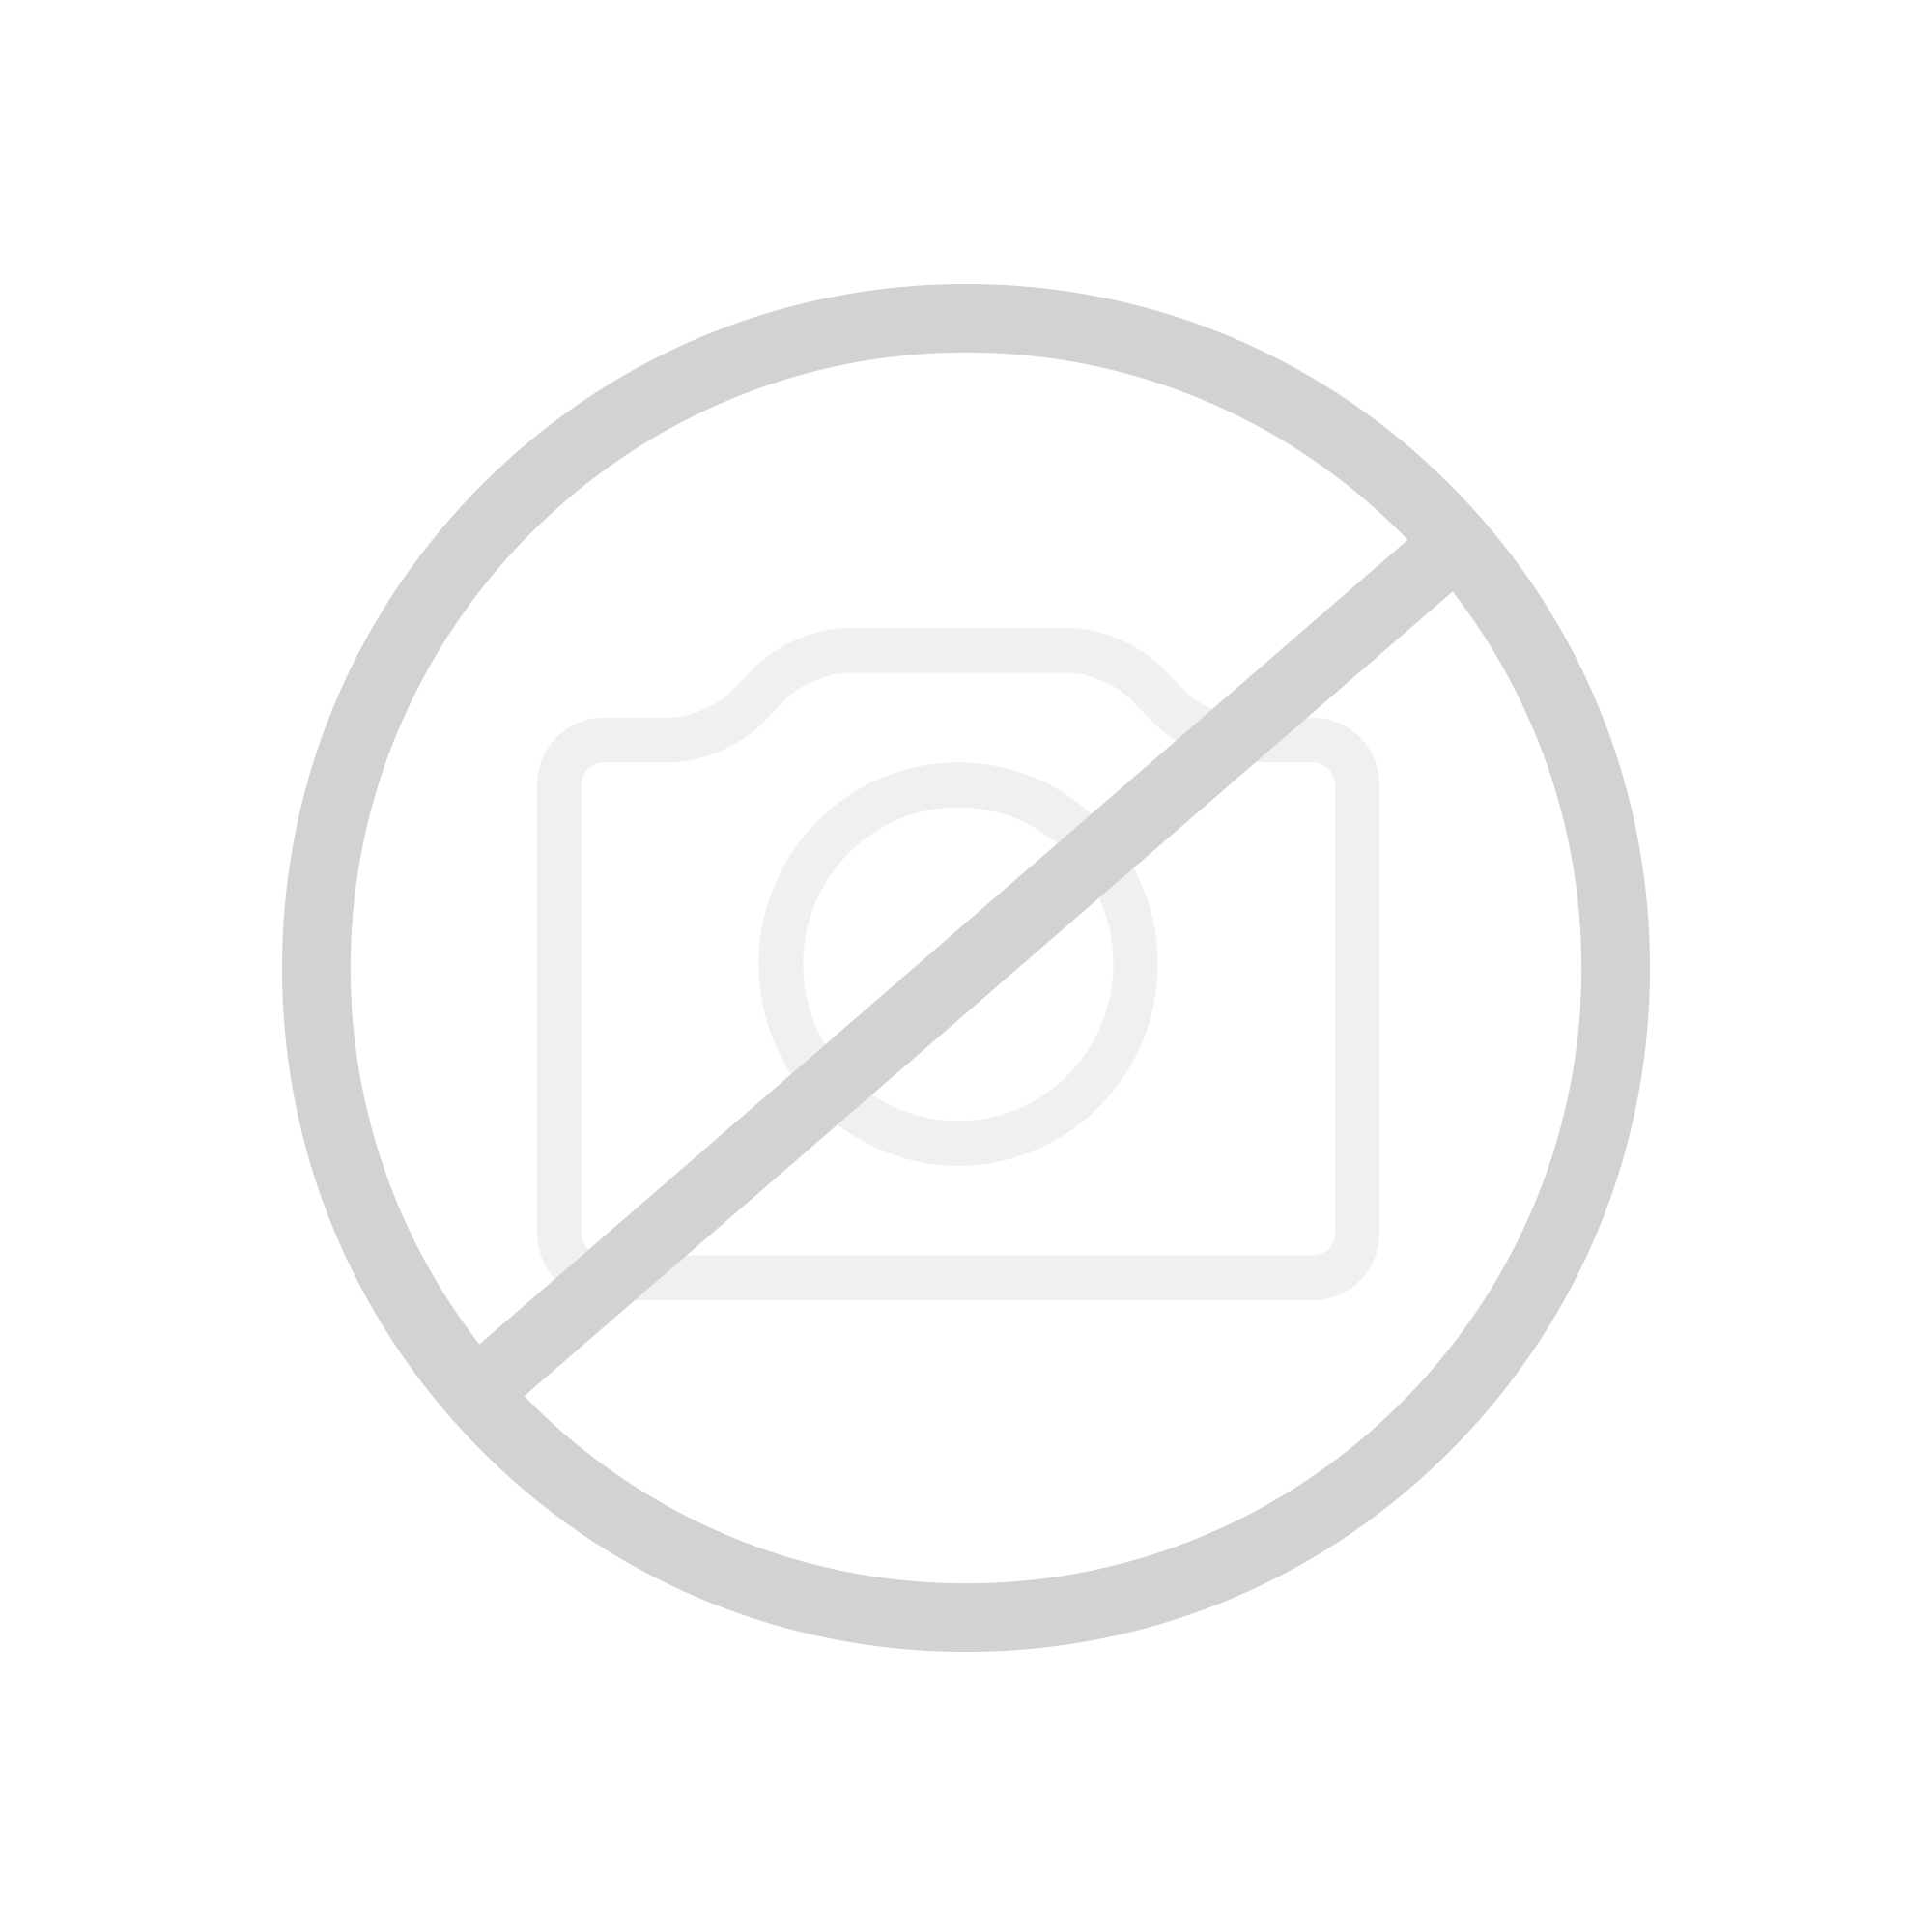 geberit ap sp lkasten ap127 mit sp l stopp sp lung wa unten links 127022111 reuter onlineshop. Black Bedroom Furniture Sets. Home Design Ideas